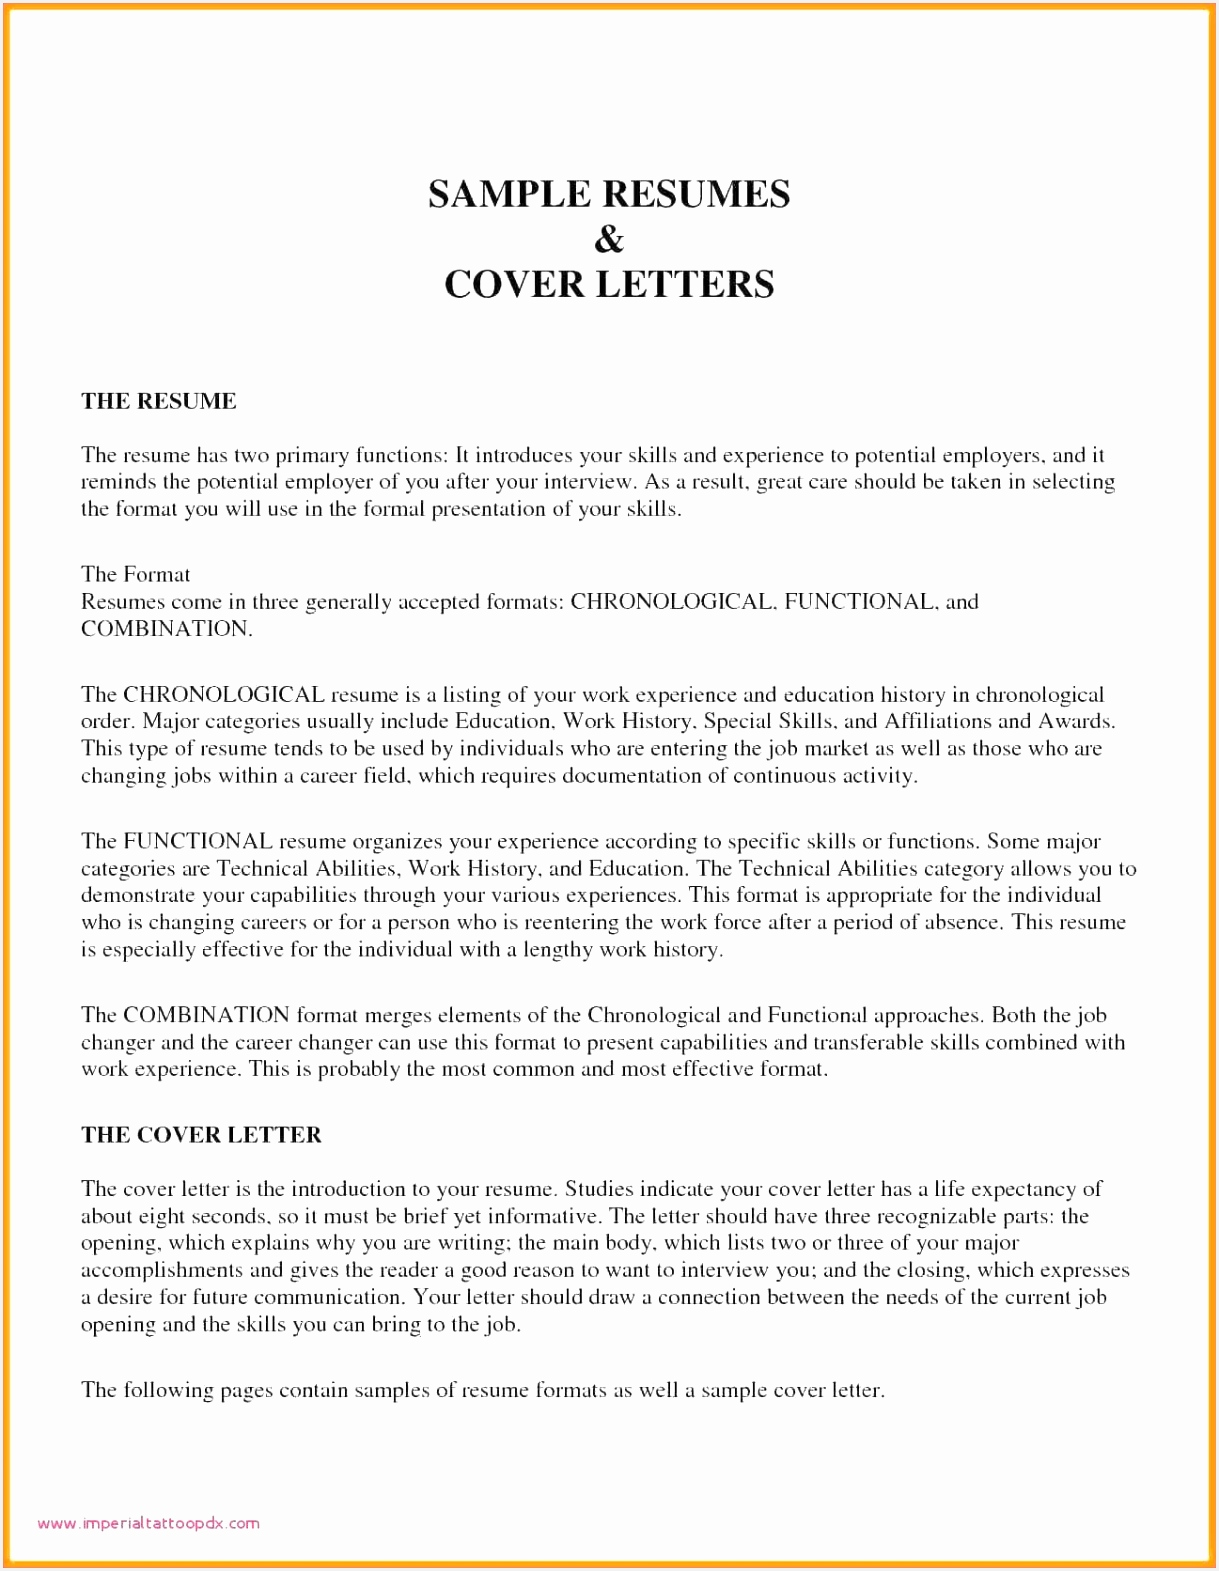 sample job history letter new cna resume sample new skills lovely bsw 0d best format template of sample job history letter 15711219gevIc